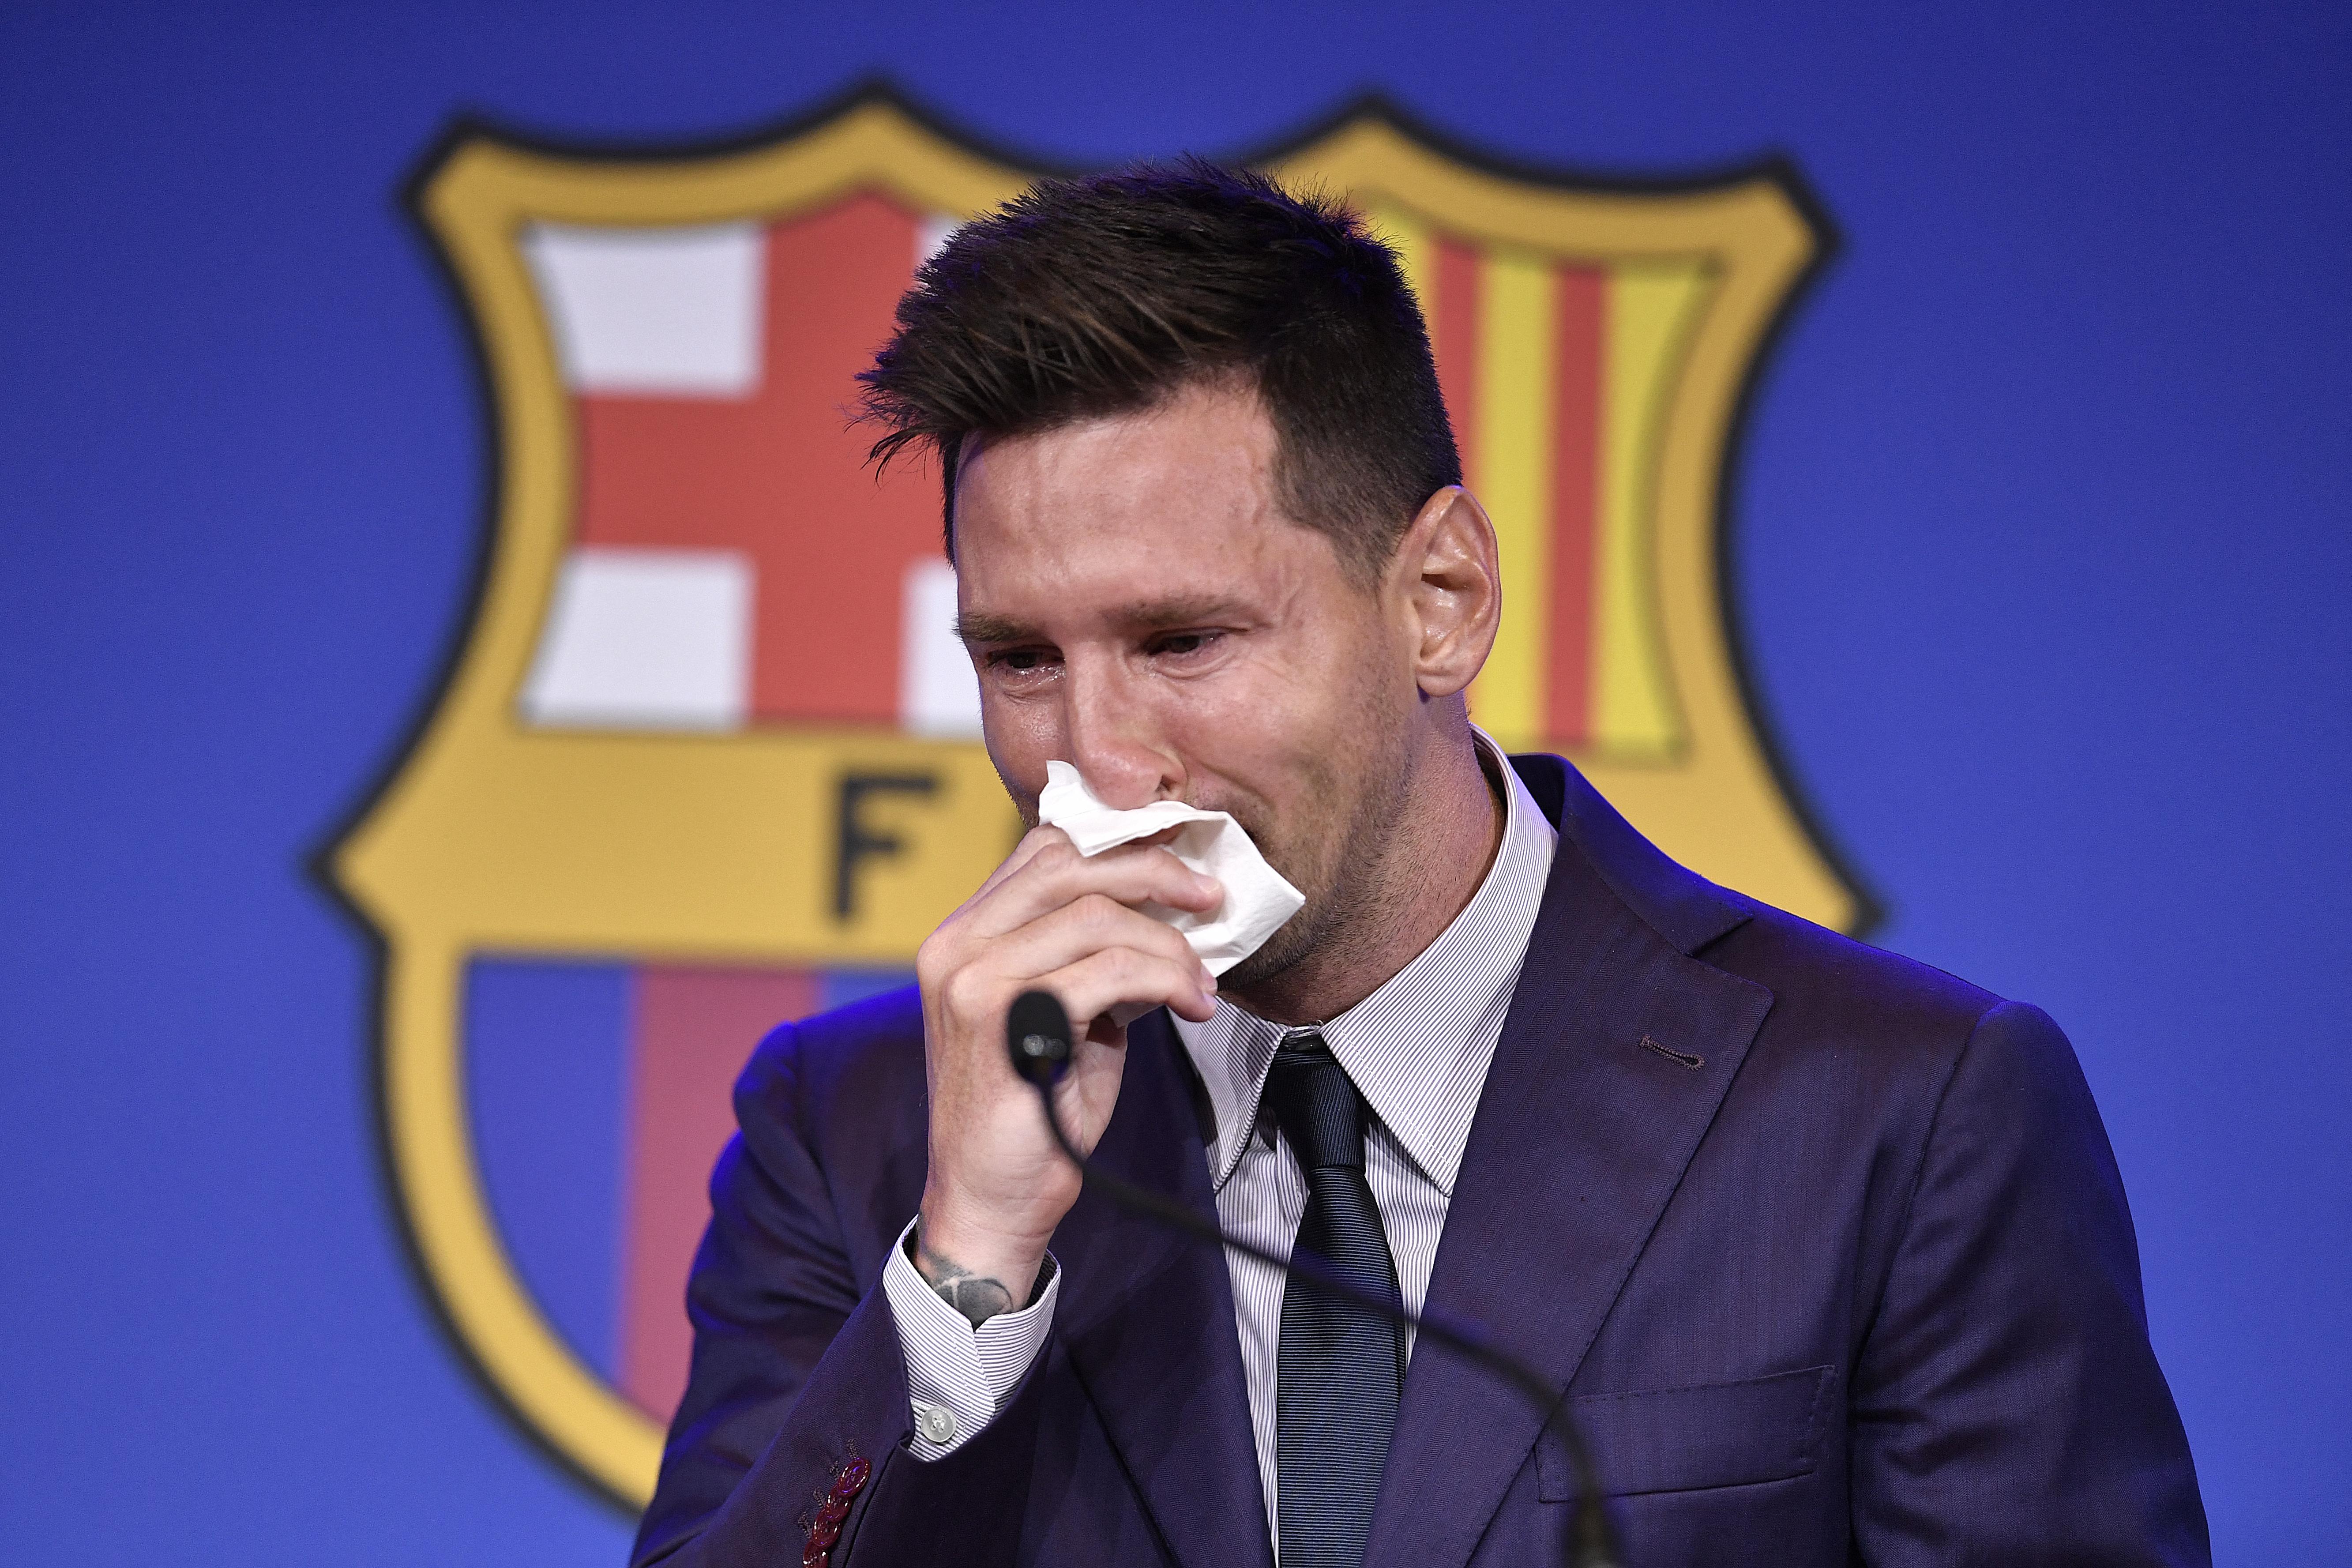 Messi sírva jelentette be, hogy elhagyja Barcelonát